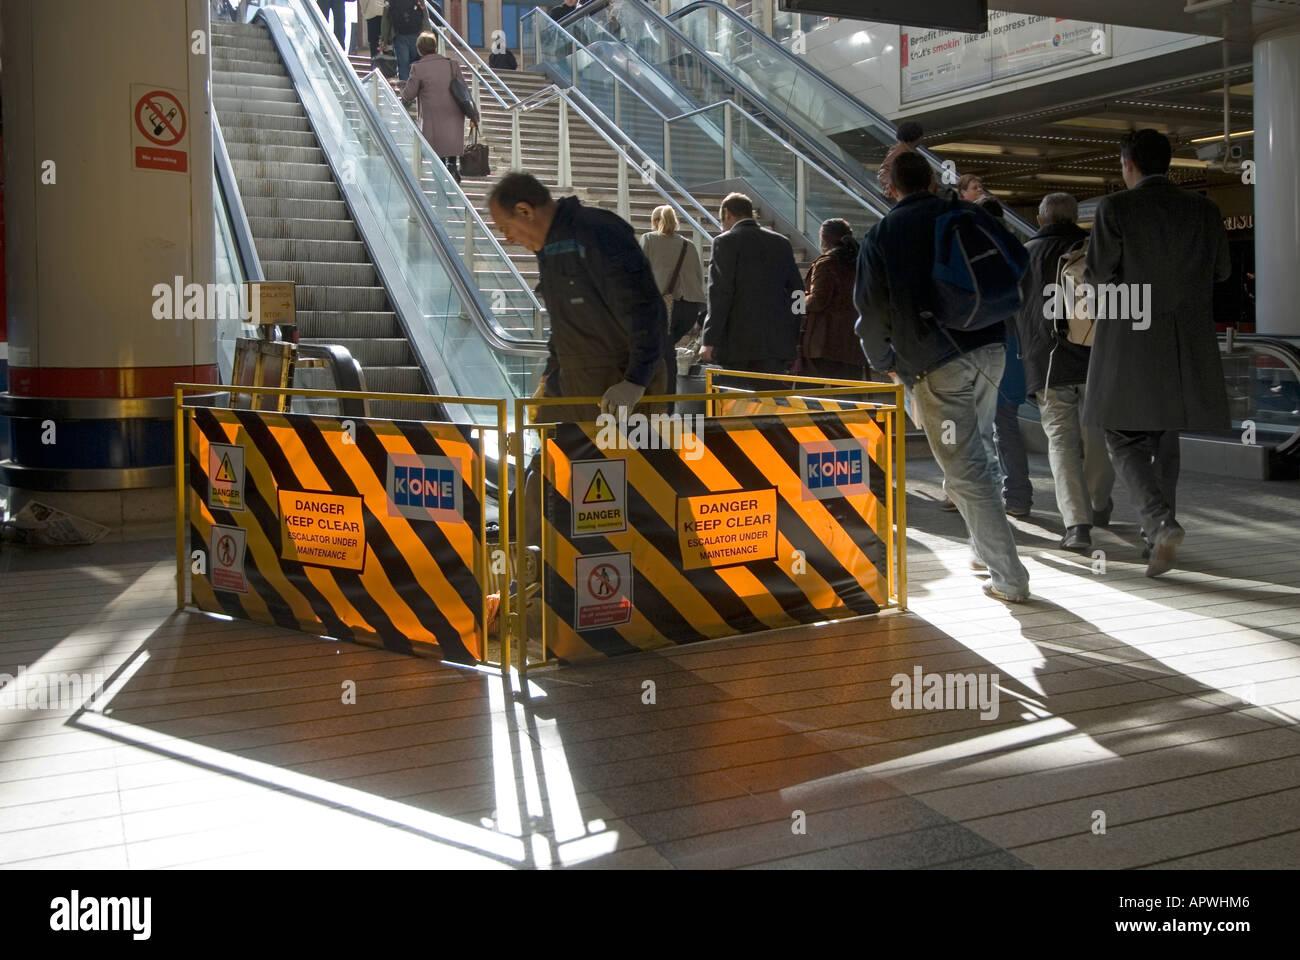 Liverpool Street mainline railway terminal concourse escalator repair crew working behind translucent barriers - Stock Image